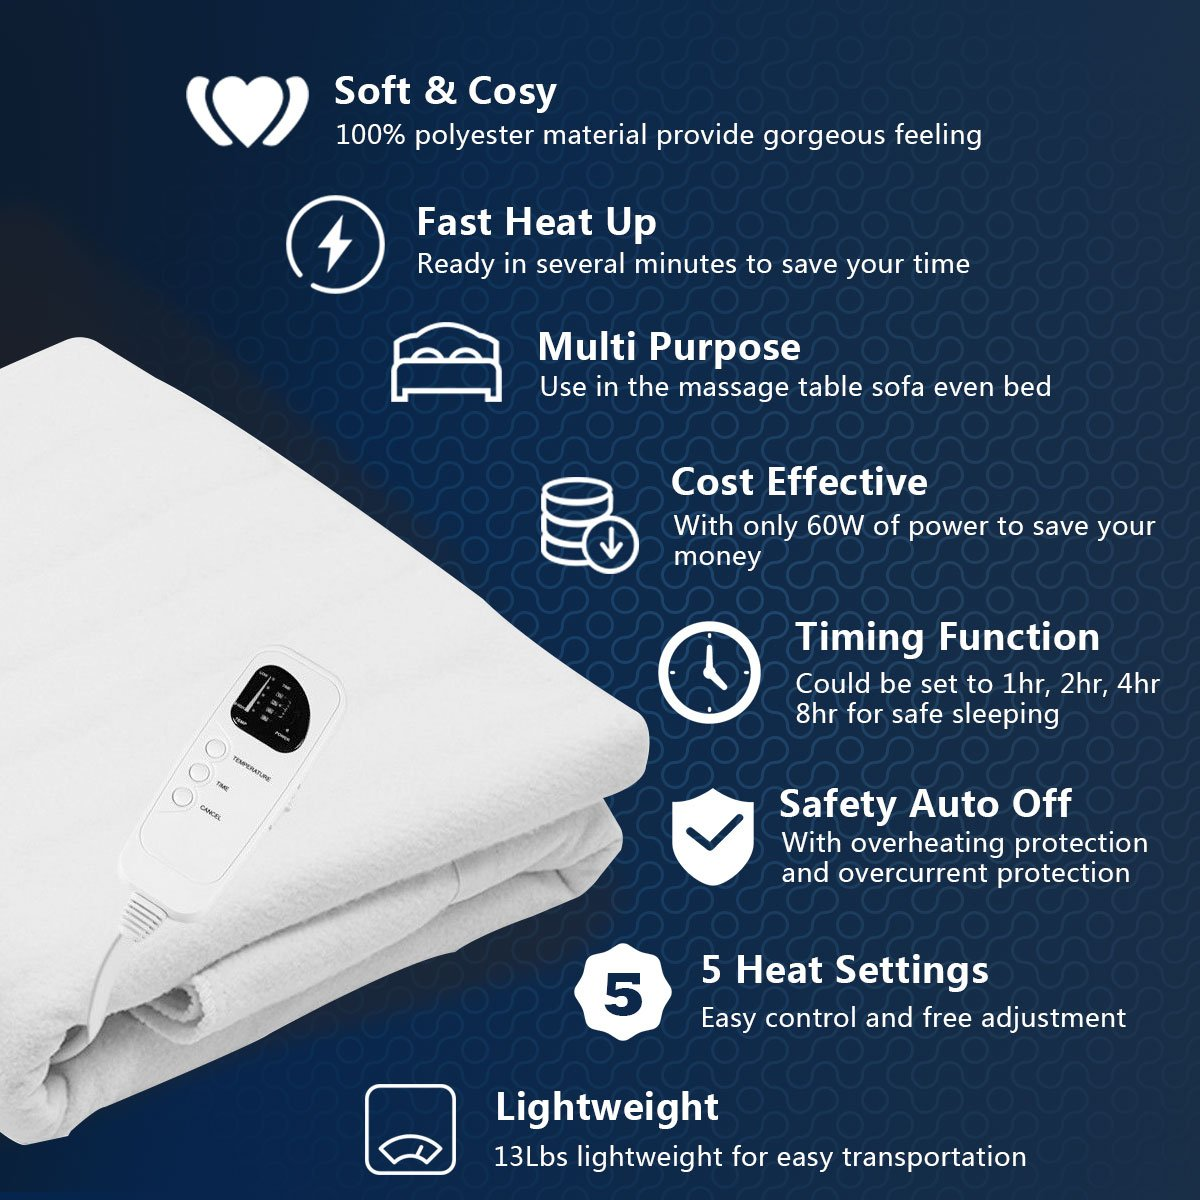 Five Heat Settings Giantex Massage Table Warmer Pad Digital Heat Settings Digital Timer Portable Auto Overheat Protection HW56271US